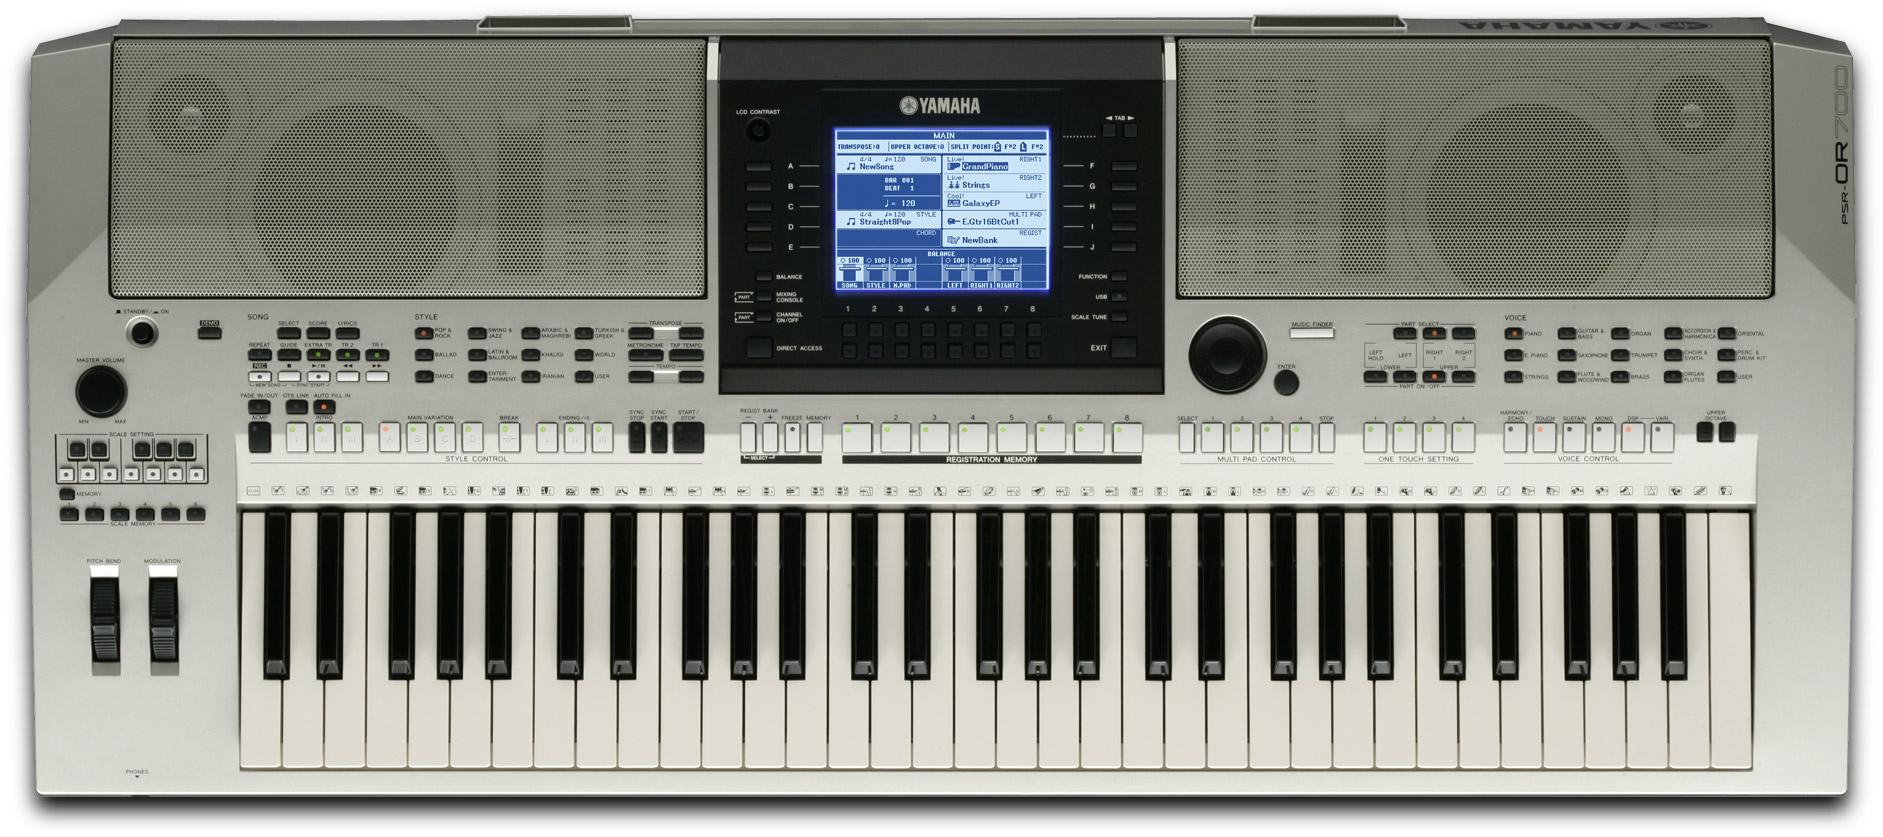 Yamaha psr e403 image 249968 audiofanzine for Yamaha psr 410 keyboard